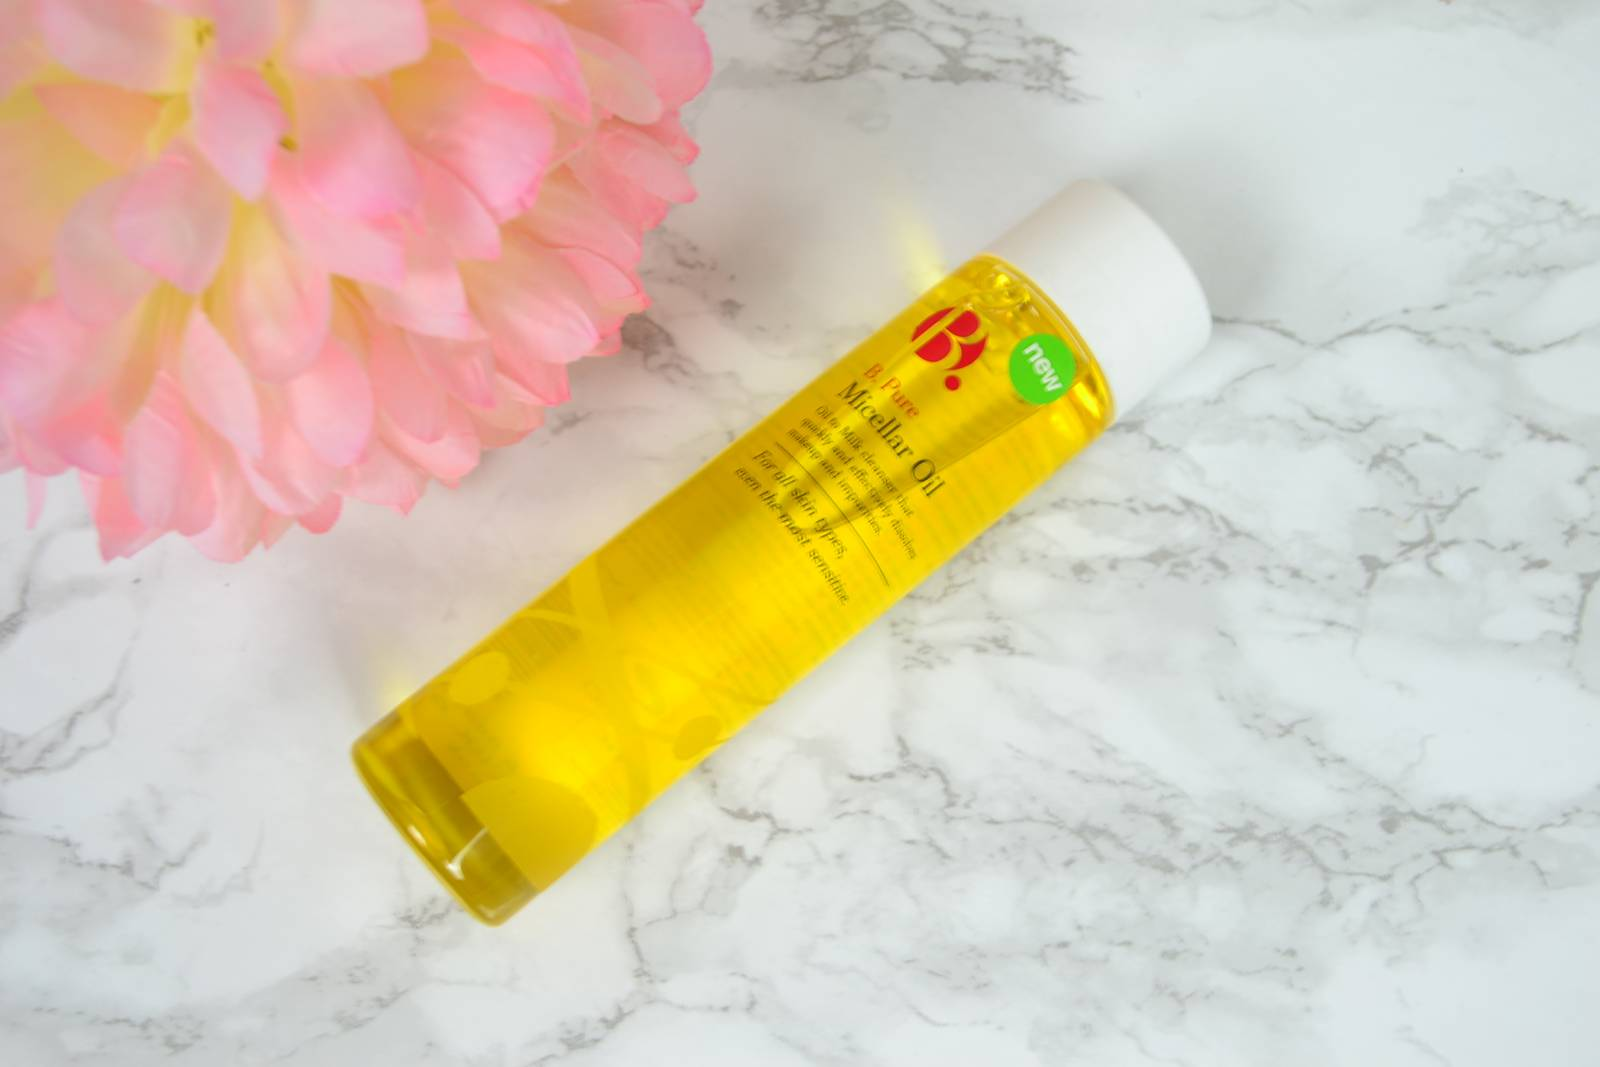 b-pure-micellar-oil